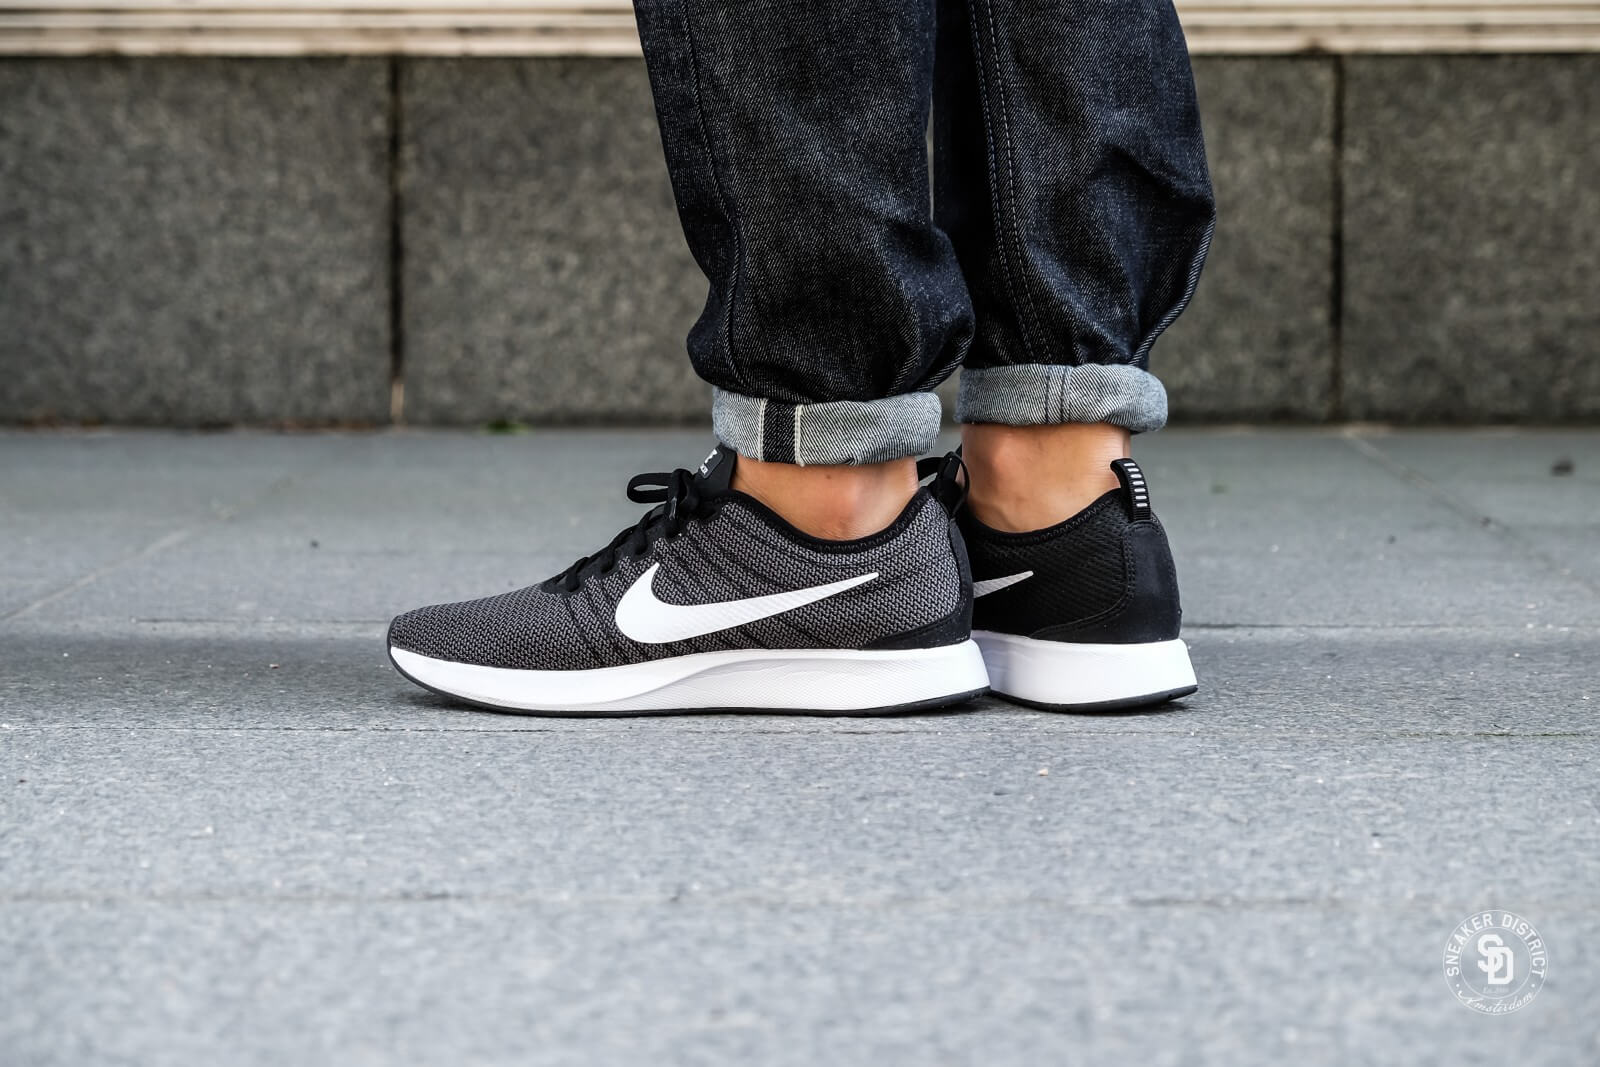 Nike Dualtone Racer BlackWhite Dark Grey 918227 002